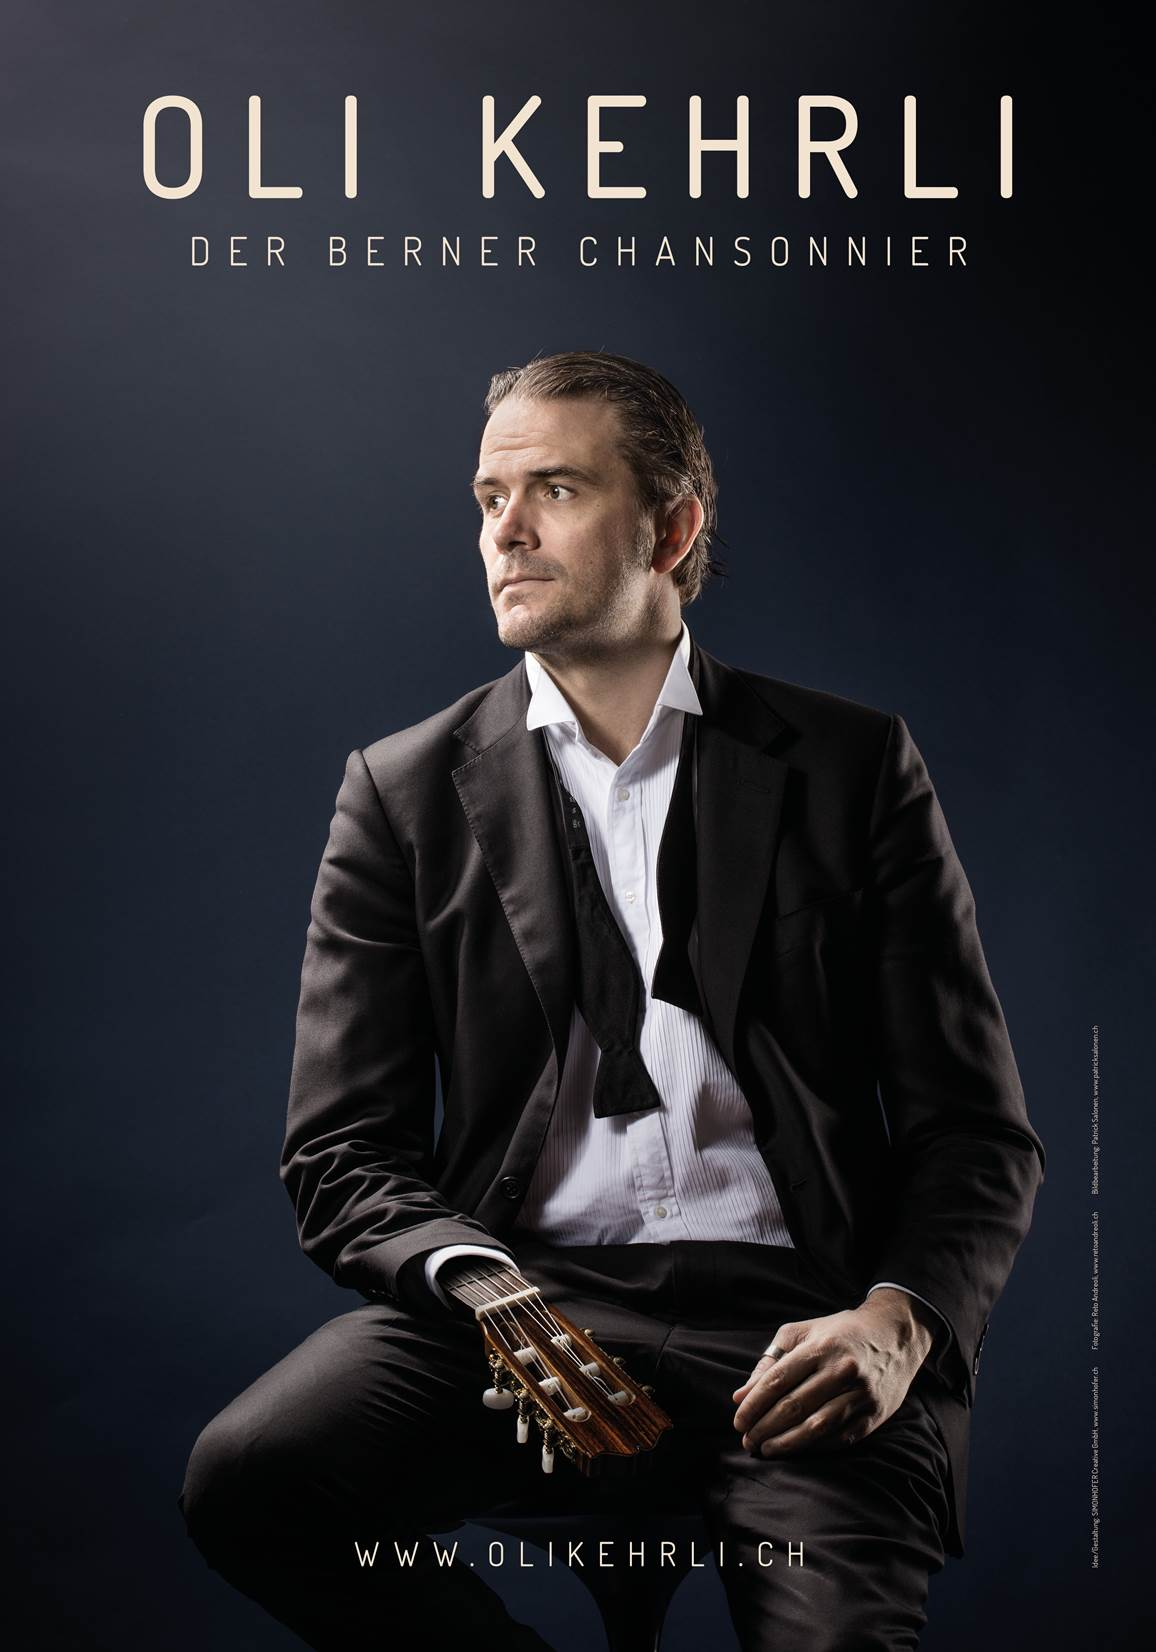 F 200 Plakatkampagne für den Berner Chansonnier Oli Kehrli